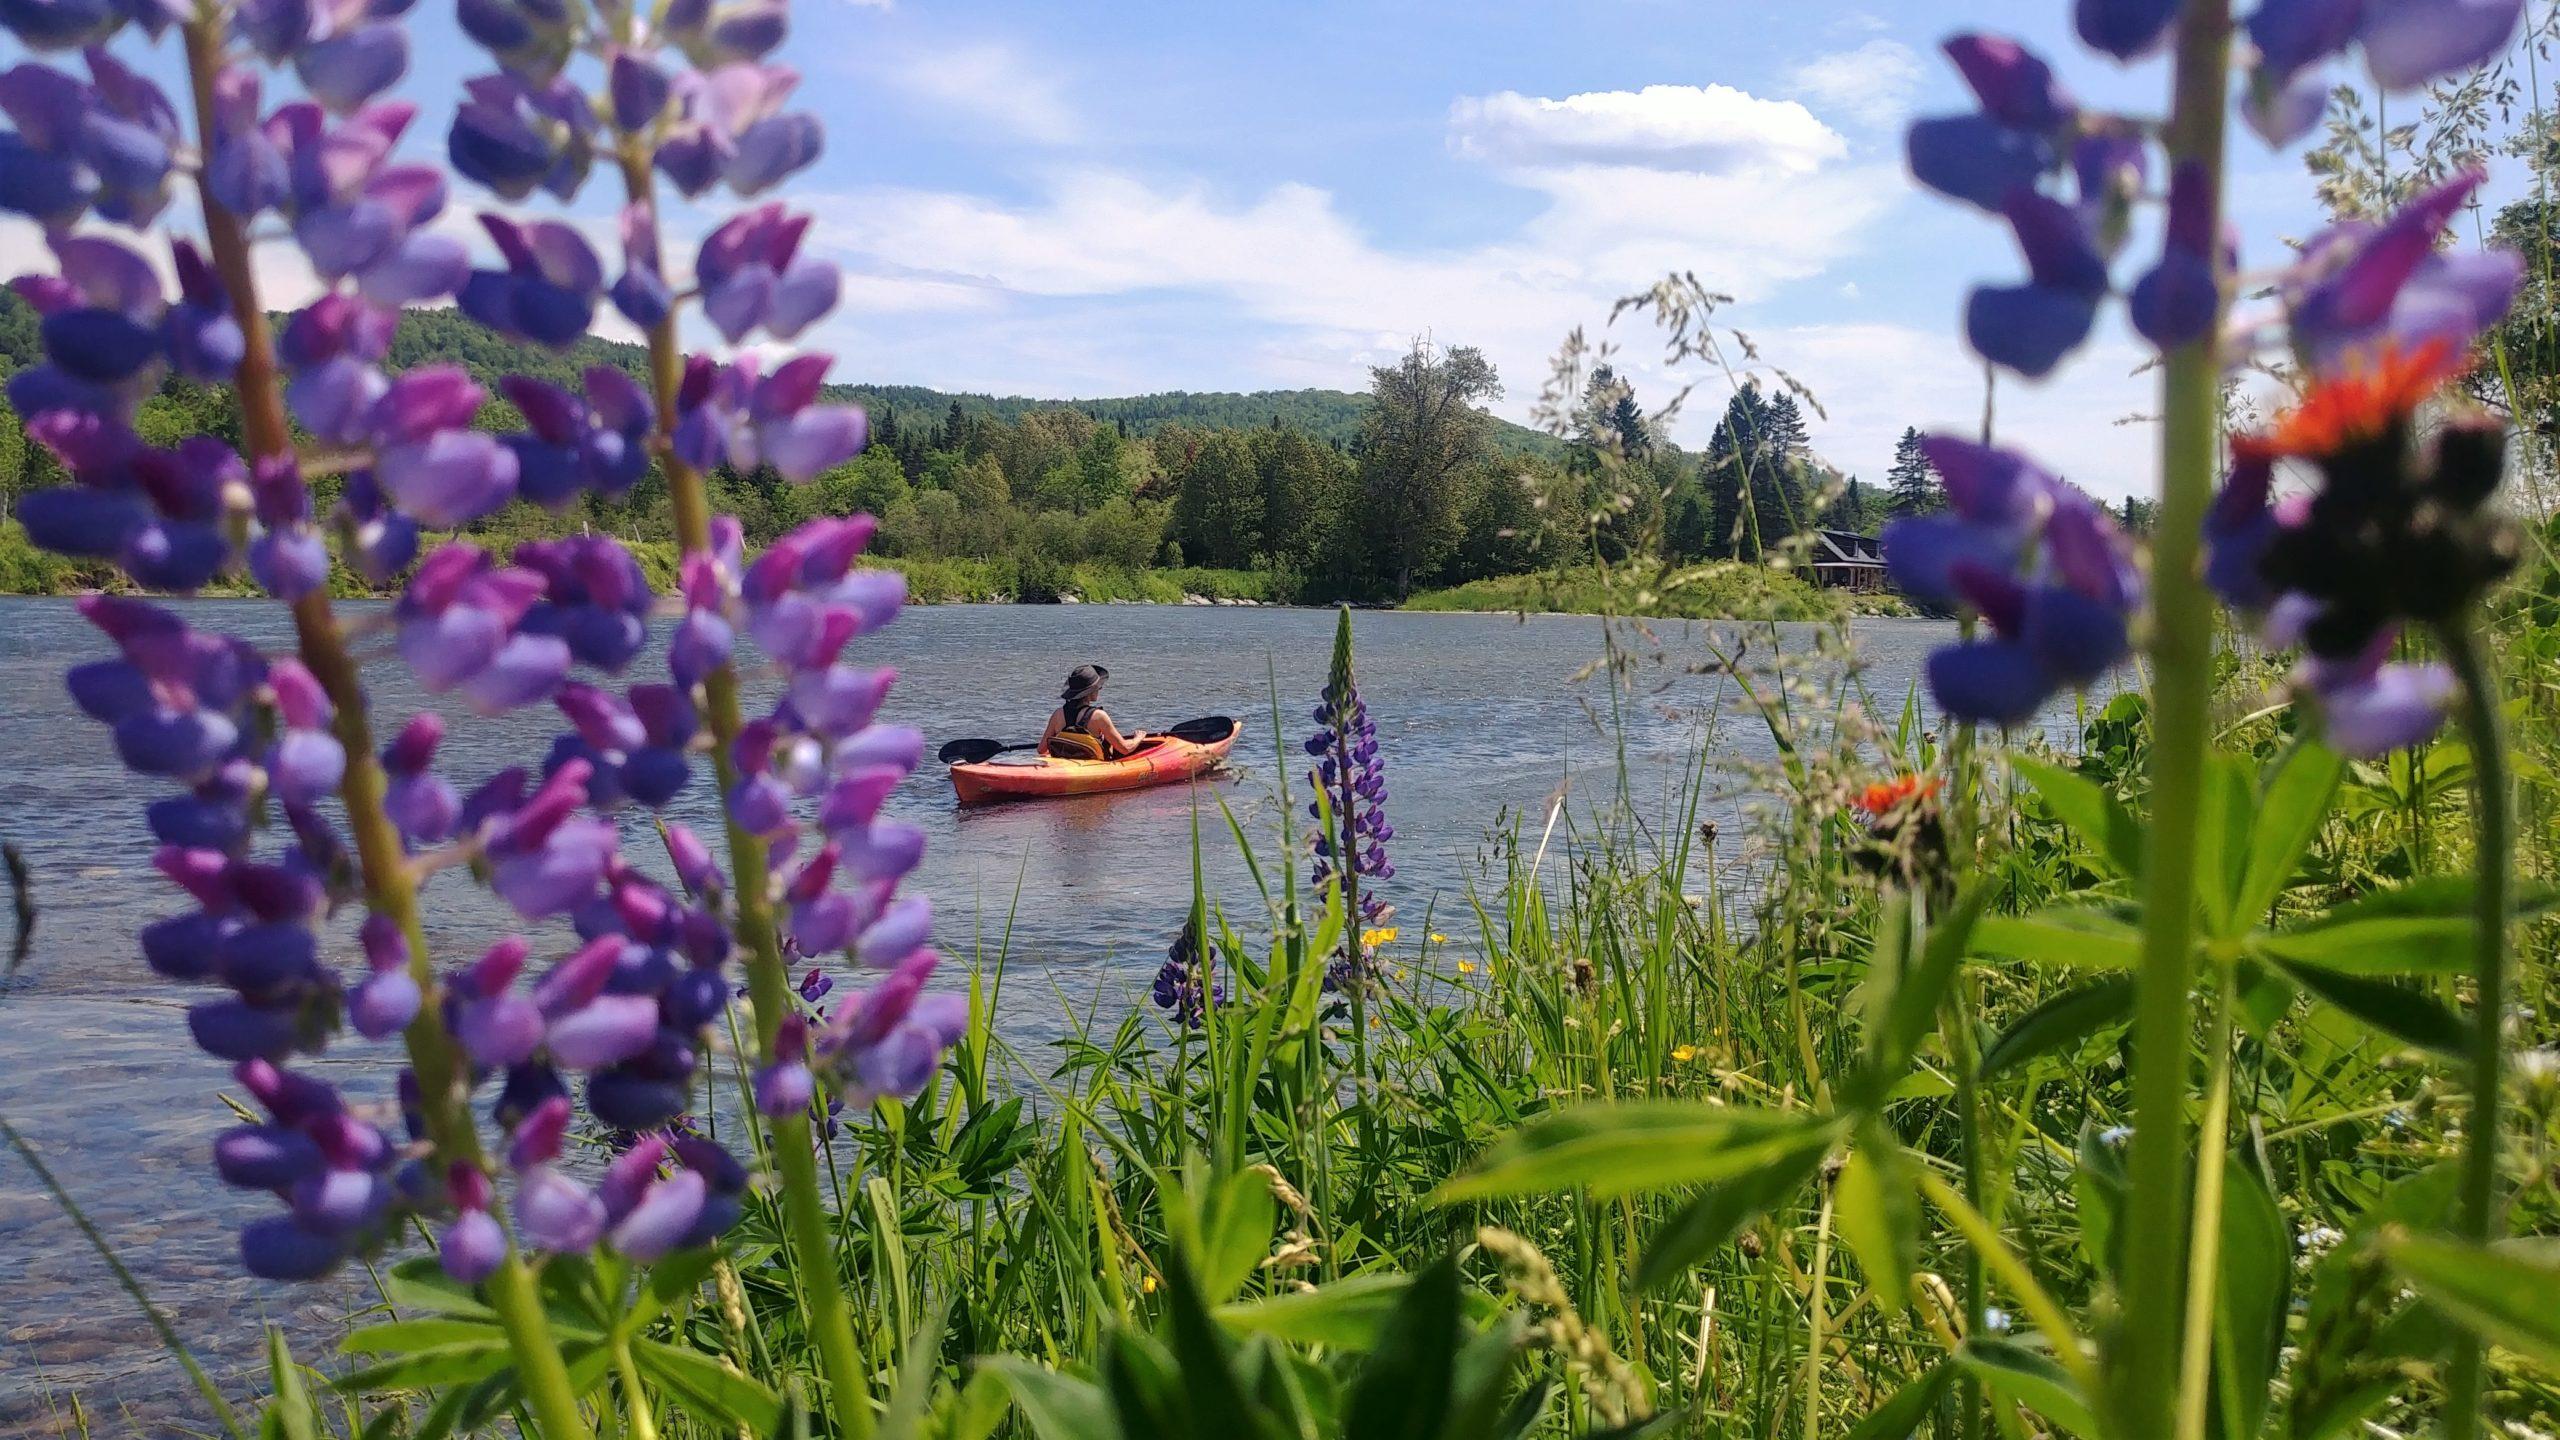 Kayak Edmundston Rivière-verte blog voyage Nouveau-Brunswick